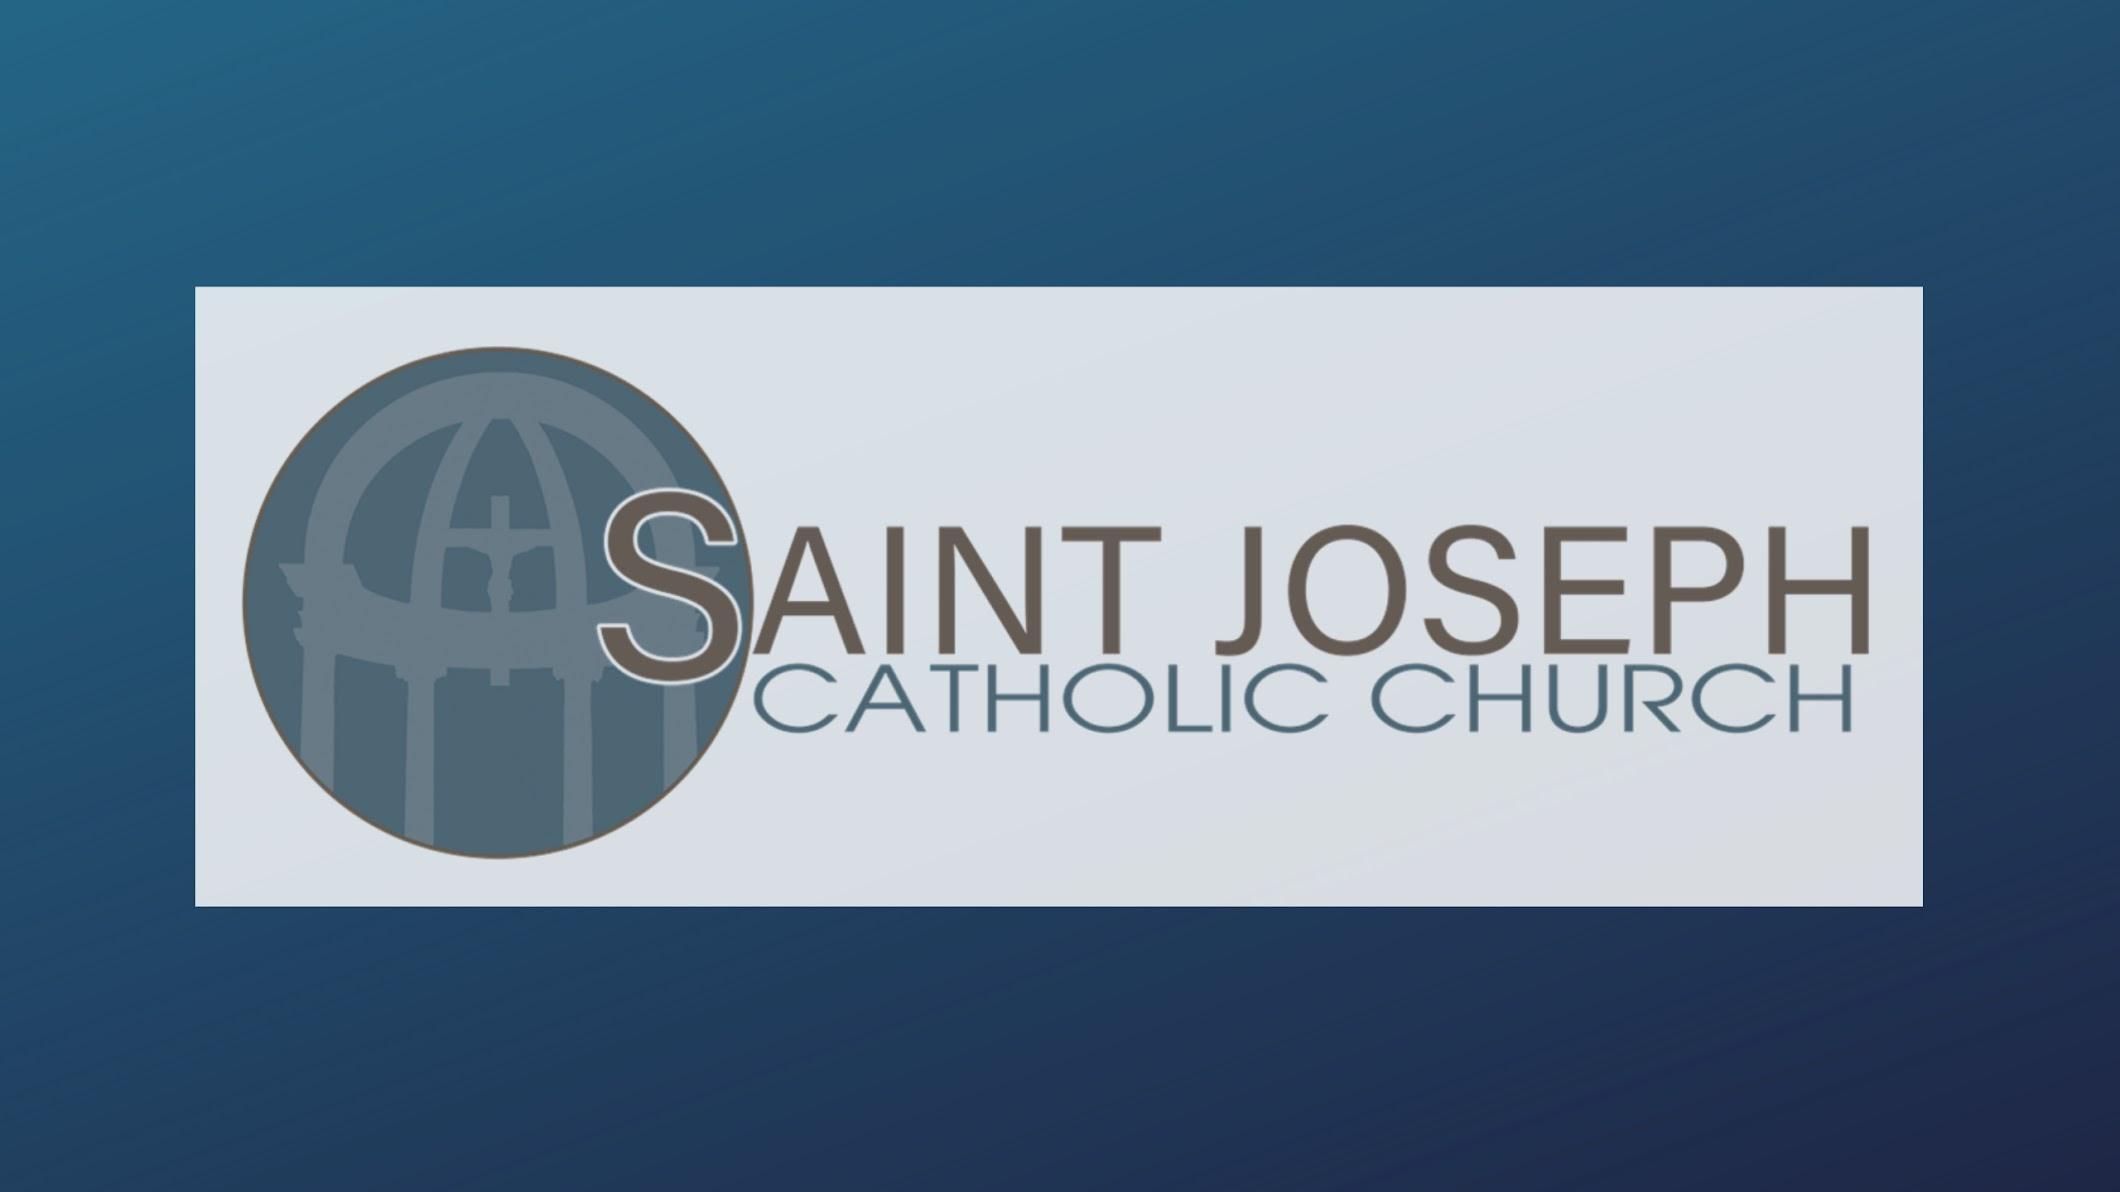 St. Joseph Catholic Church Shreveport